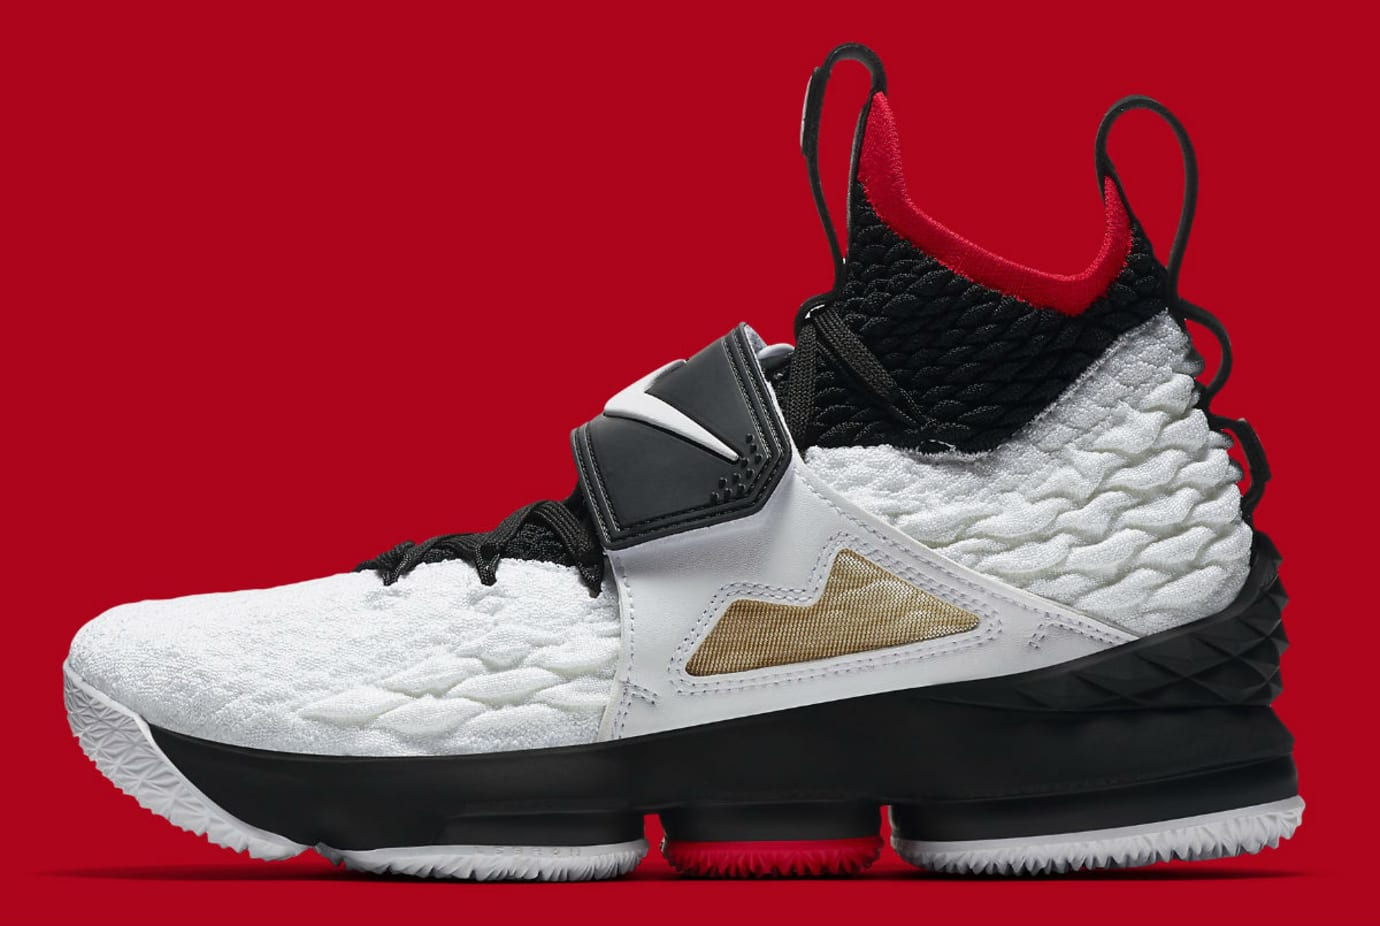 quality design 836eb 49622 Nike LeBron 15 Diamond Turf Deion Sanders Release Date ...